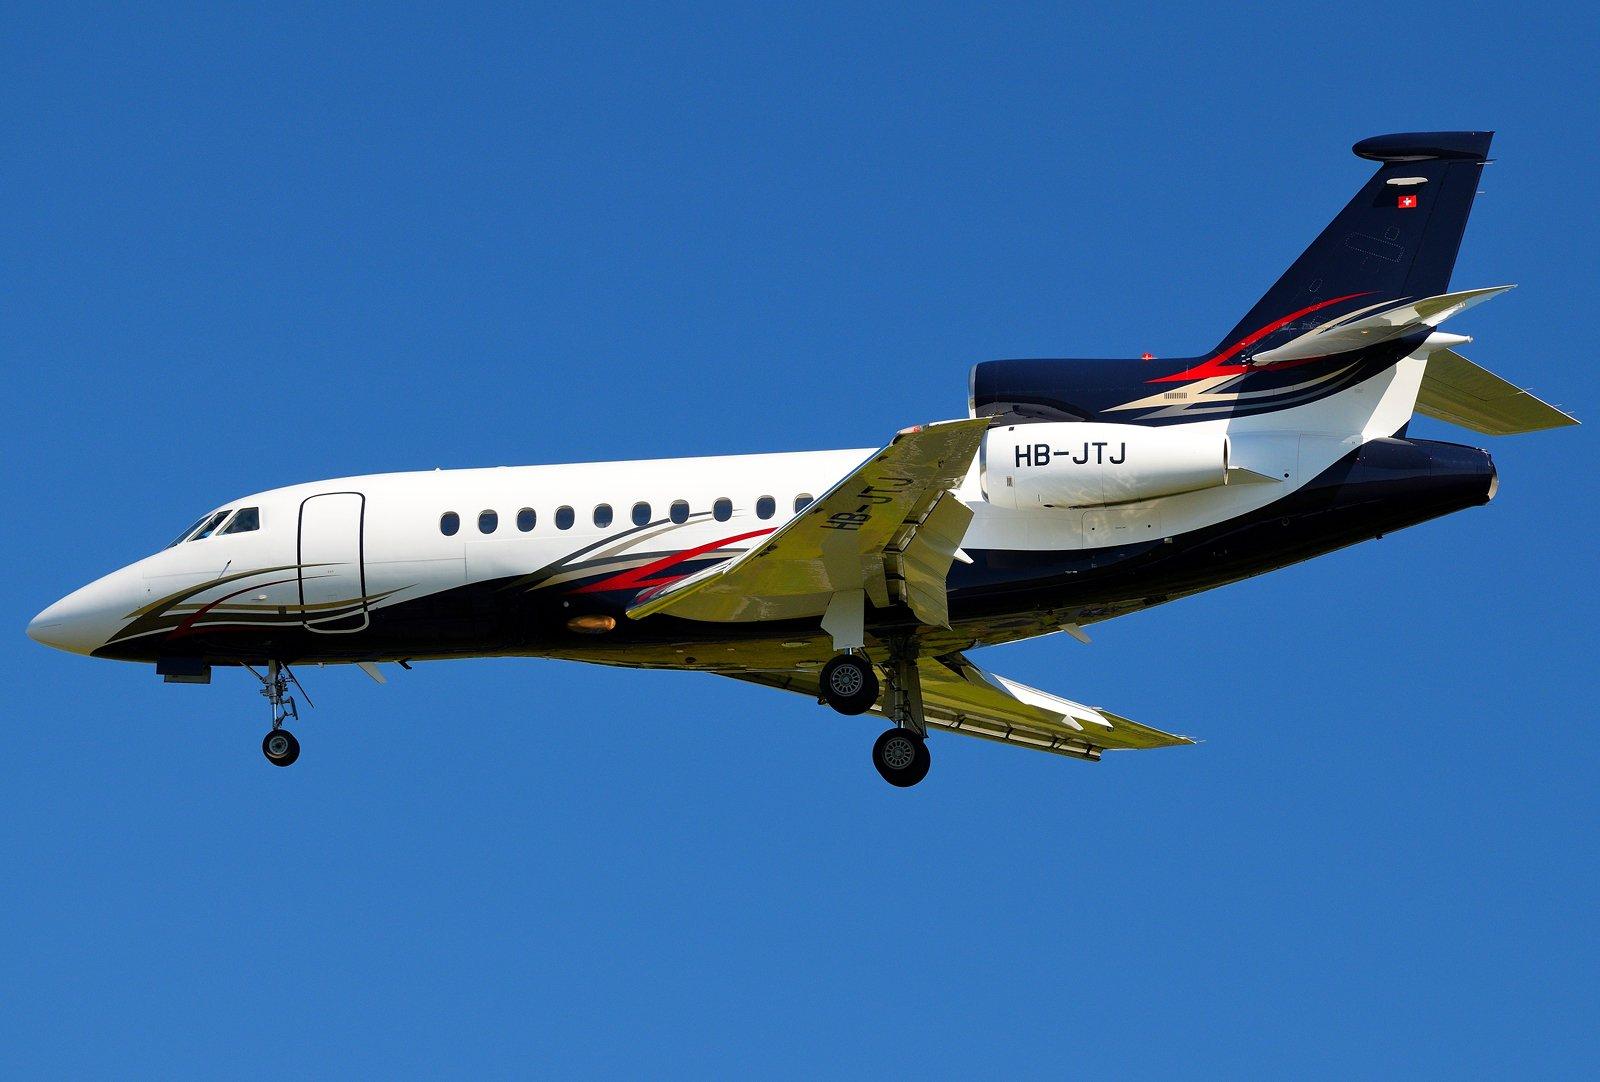 HB-JTJ - Dassault Falcon 900EX - Alpliner - 9.8.2020